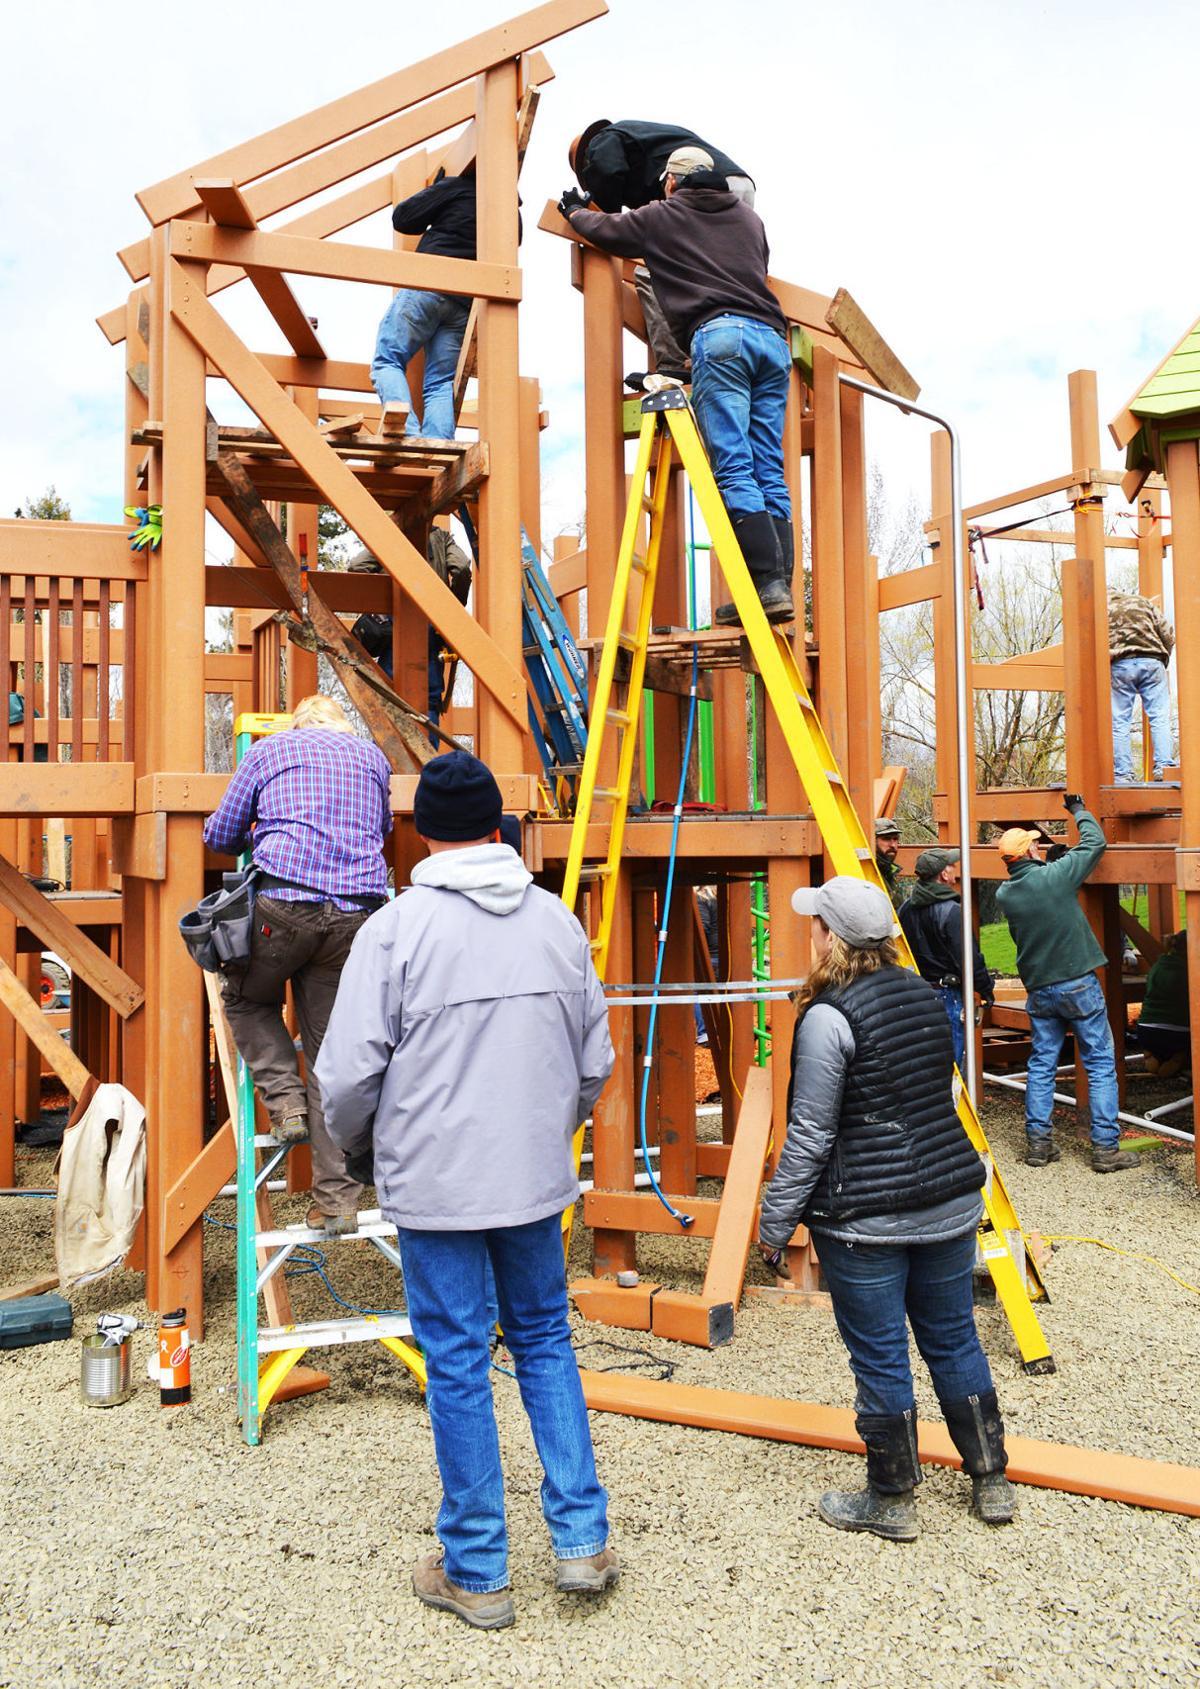 Playground in Joseph opens